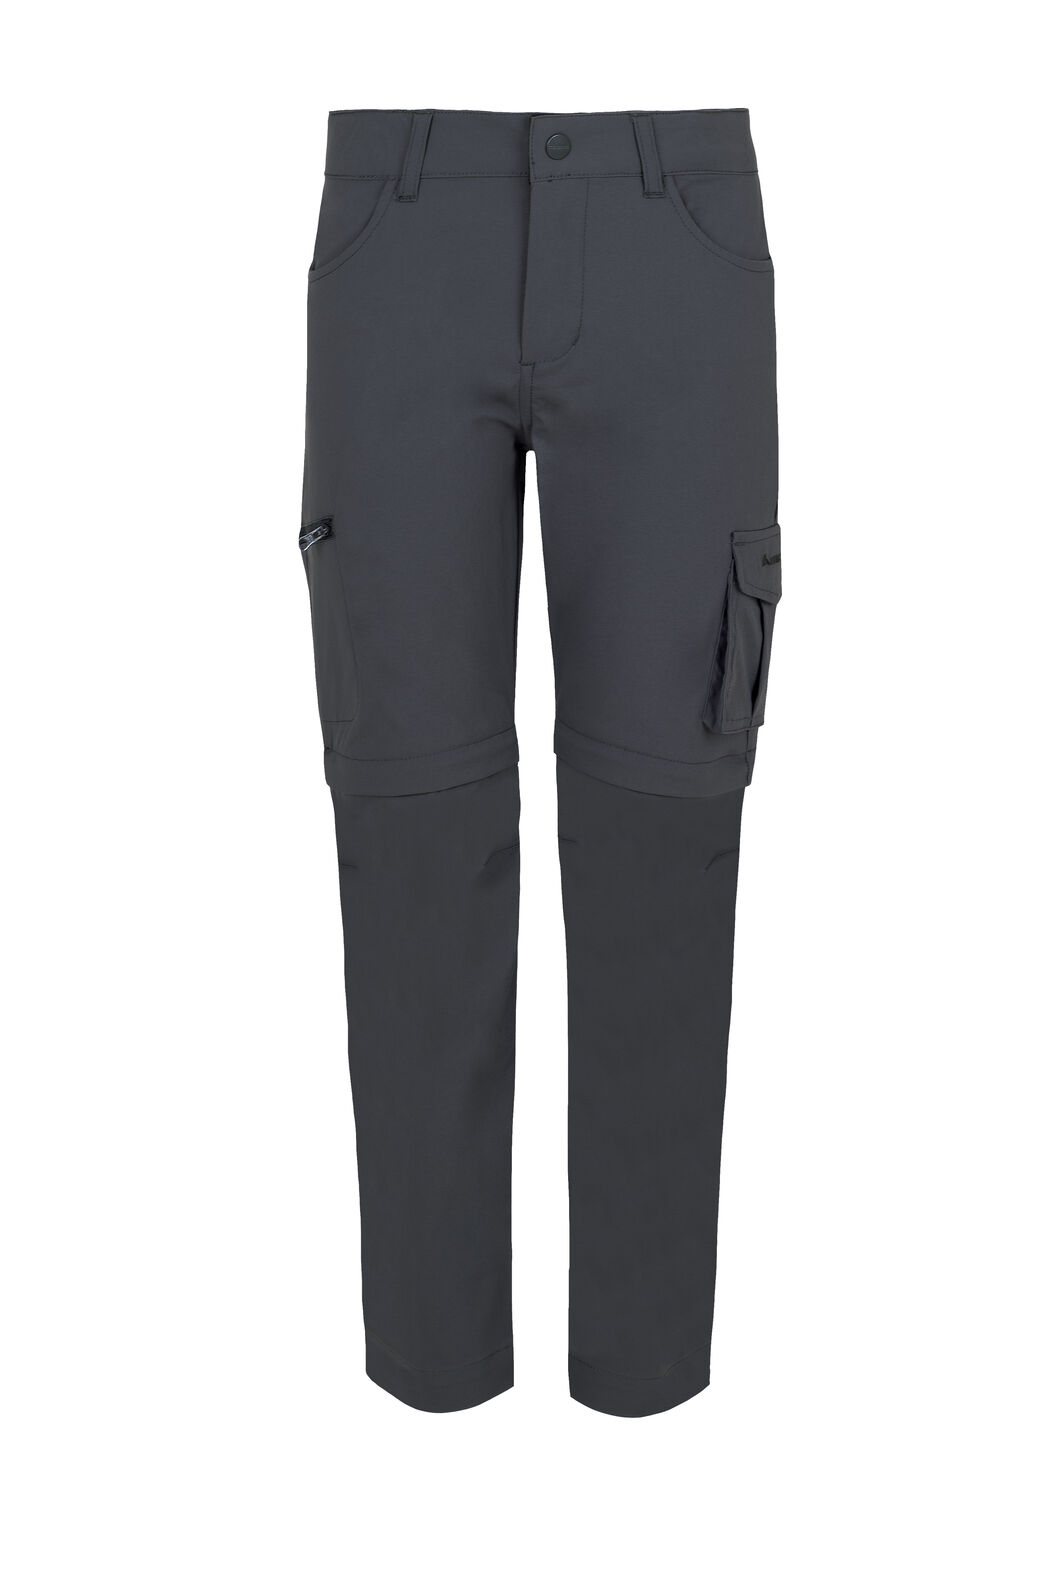 Macpac Rockover Convertible Pants - Kids', Asphalt, hi-res